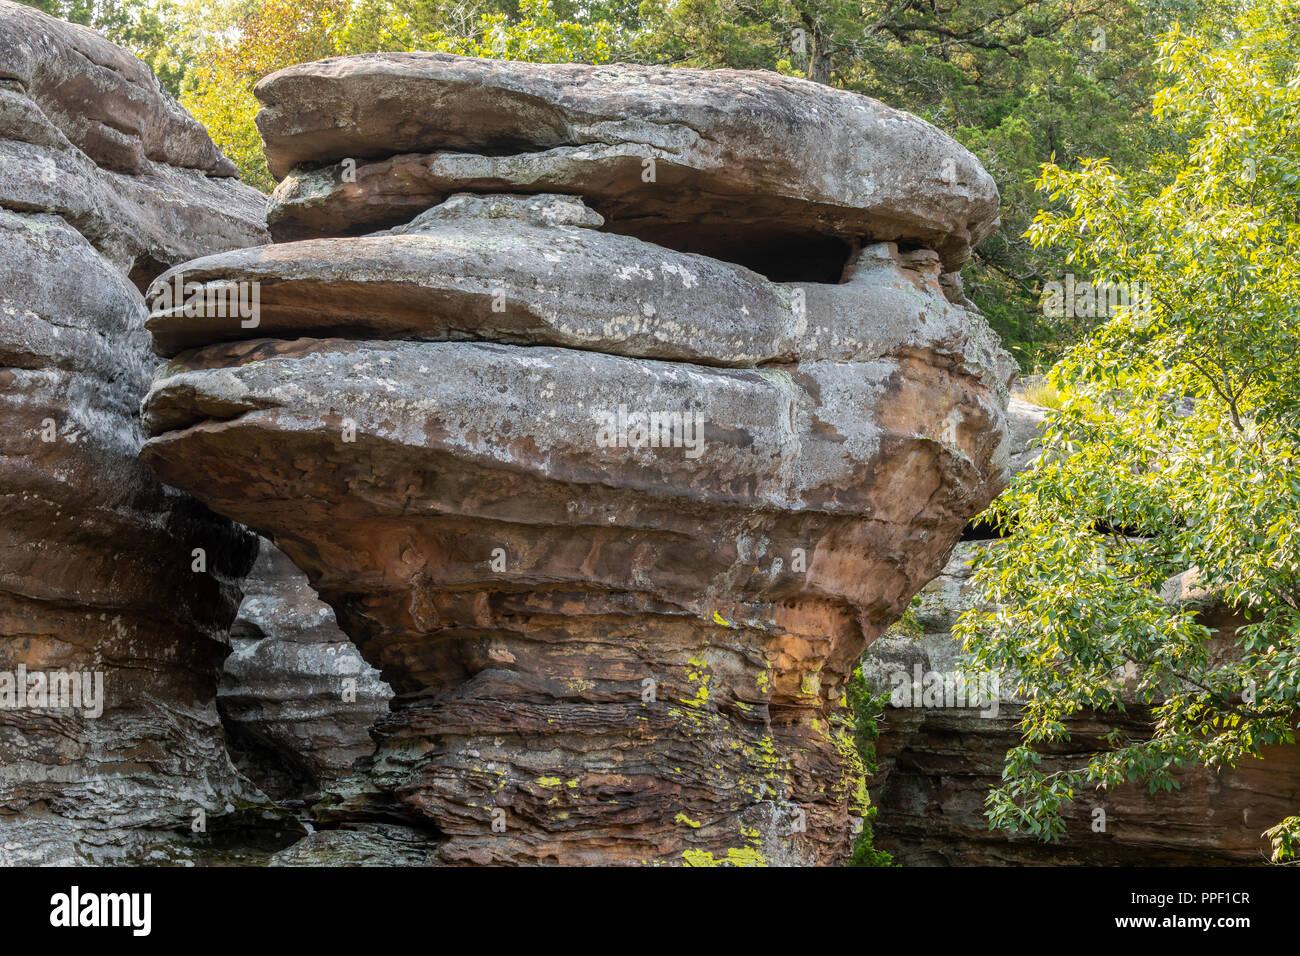 Rock Formation Scenic Landscape - Stock Image